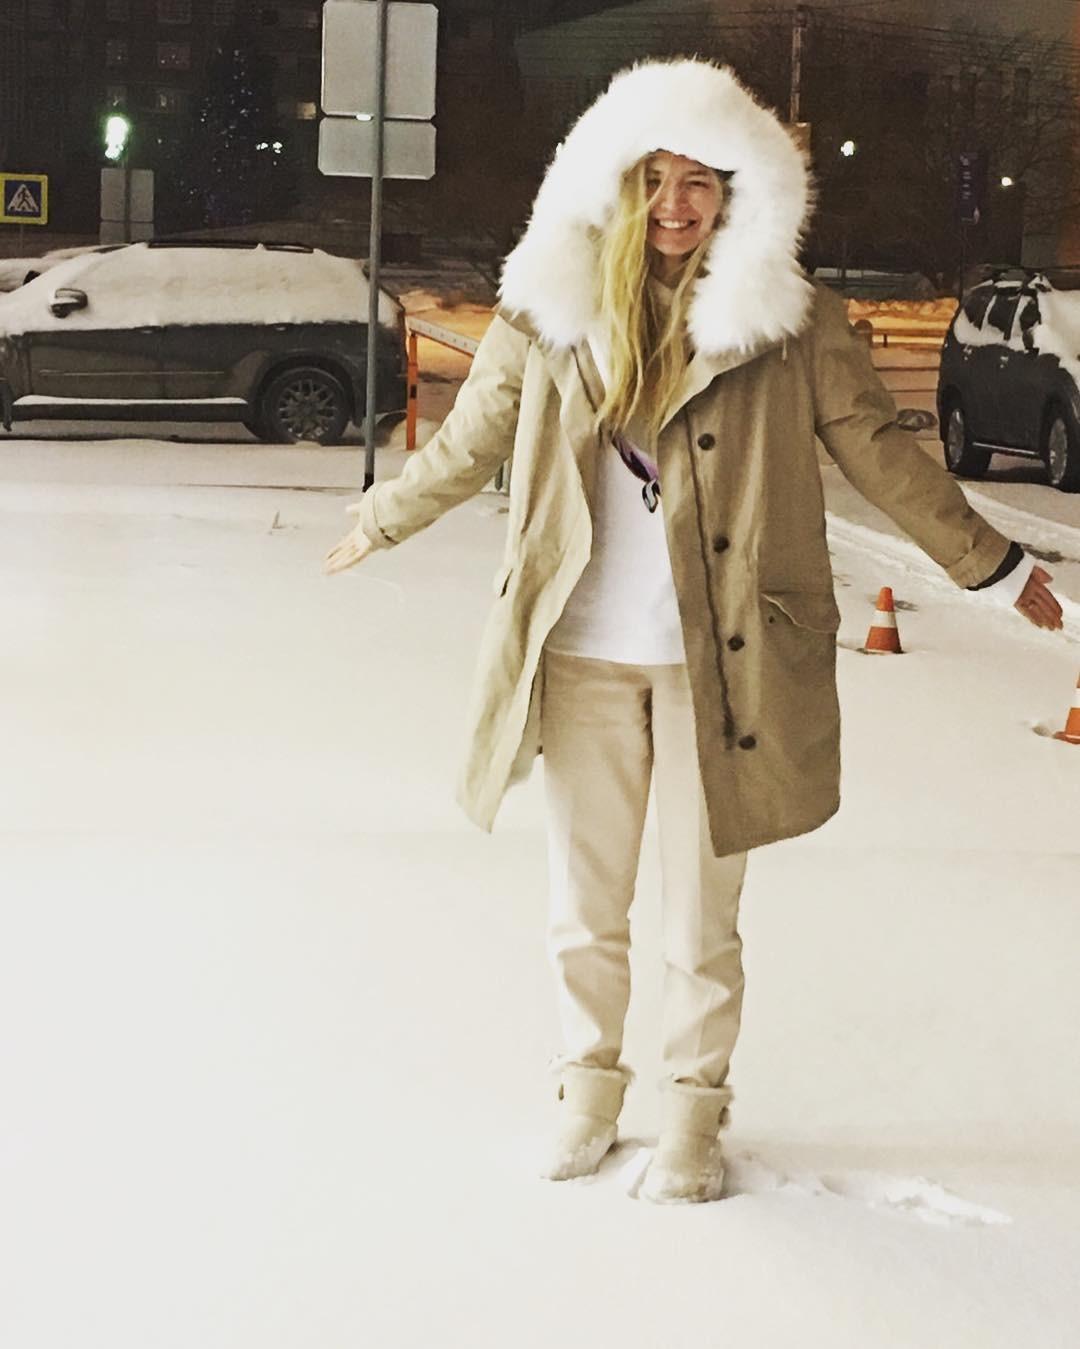 Вере Брежневой — 38: эволюция стиля певицы - галерея №7 - фото №26